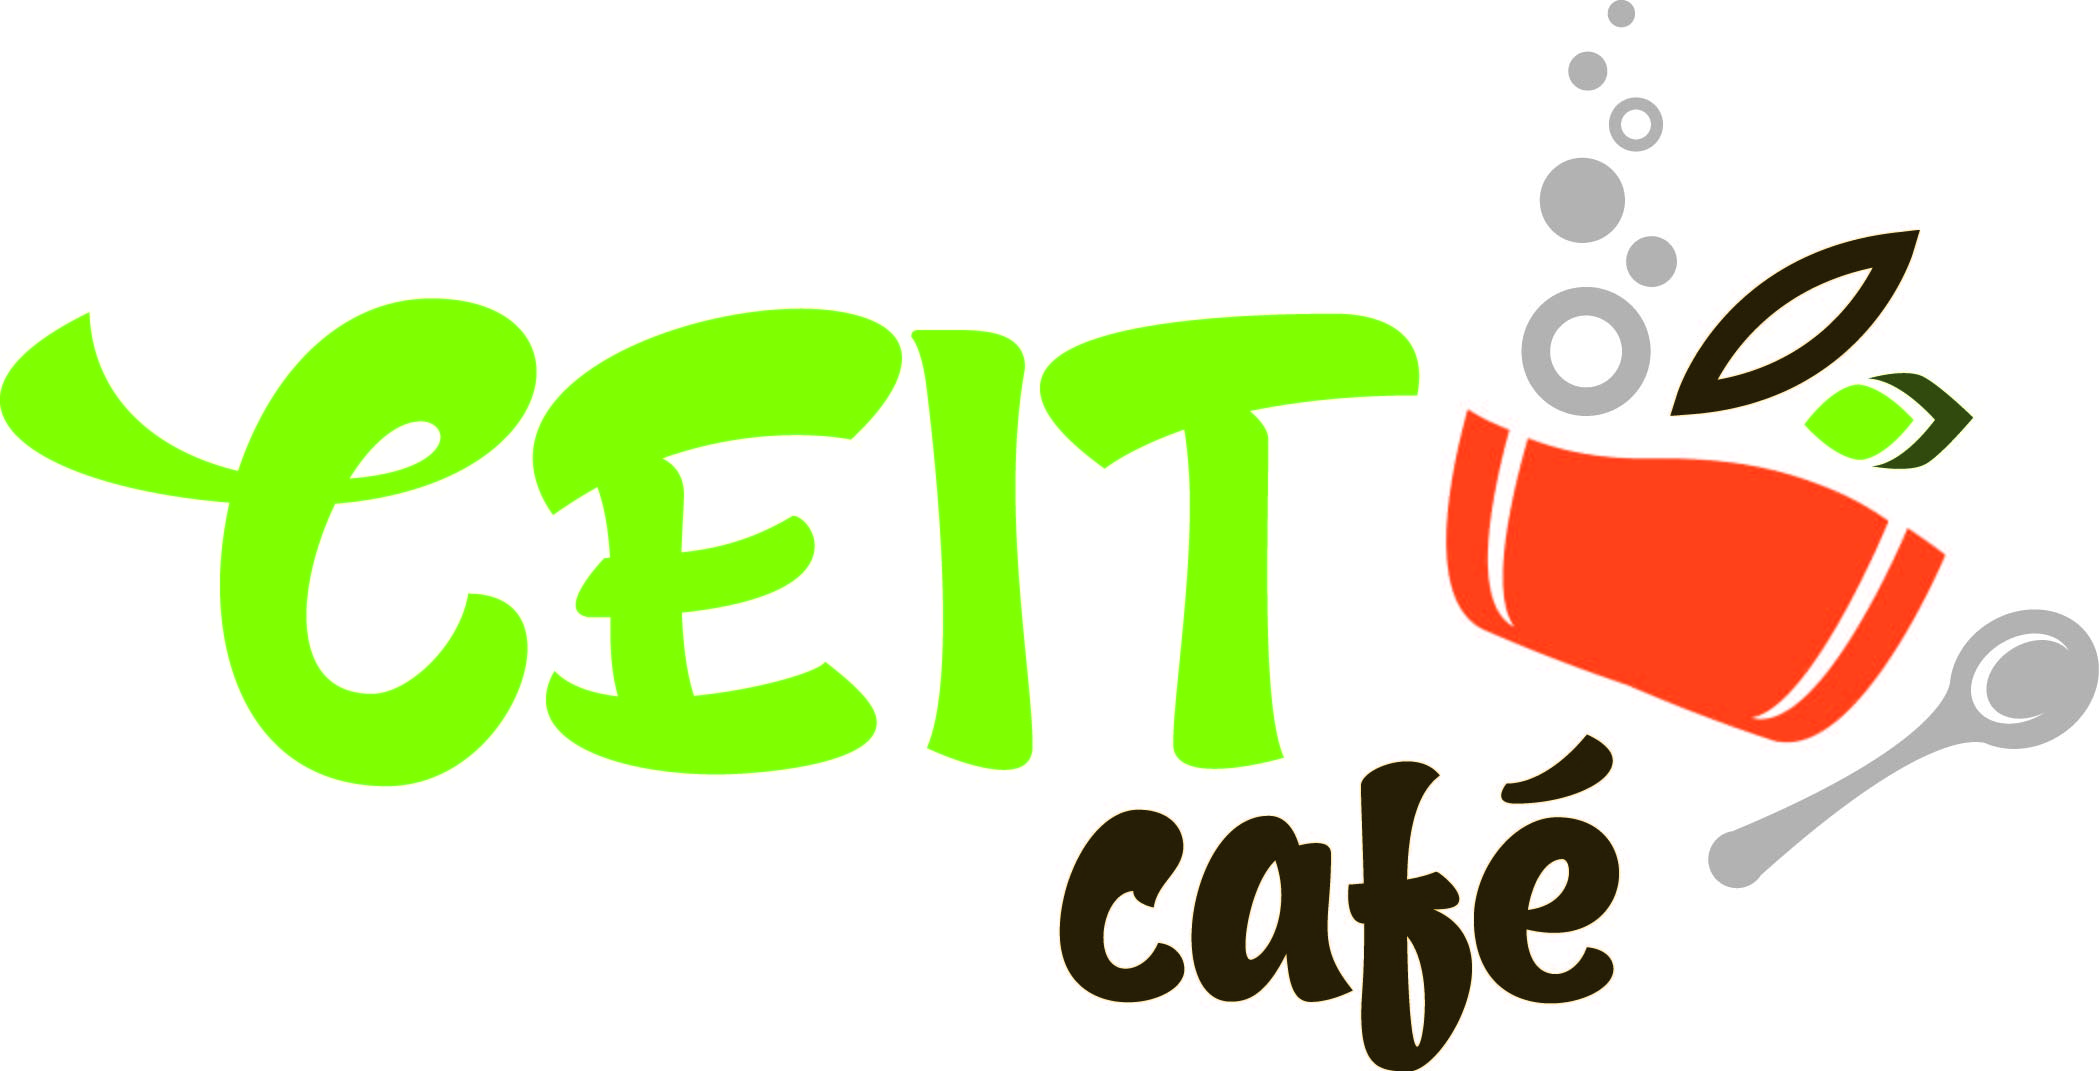 C E I T coffee shop logo